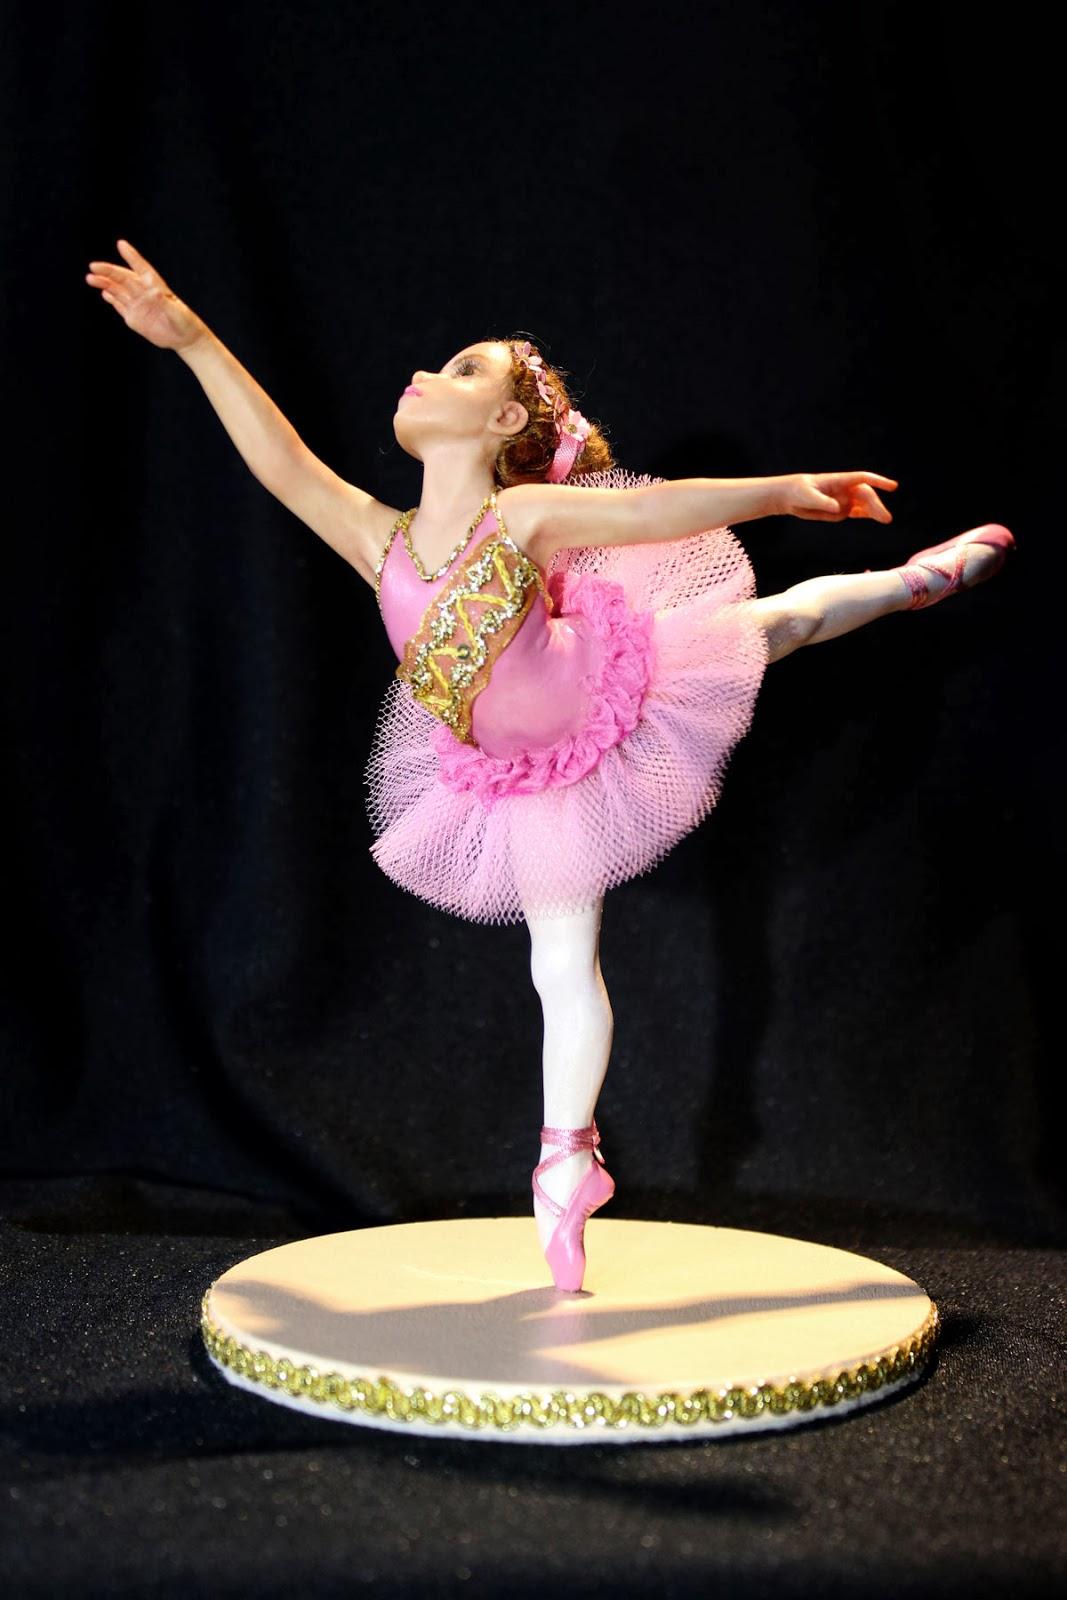 Ballet Dancer Silhouette Cake Ideas And Designs